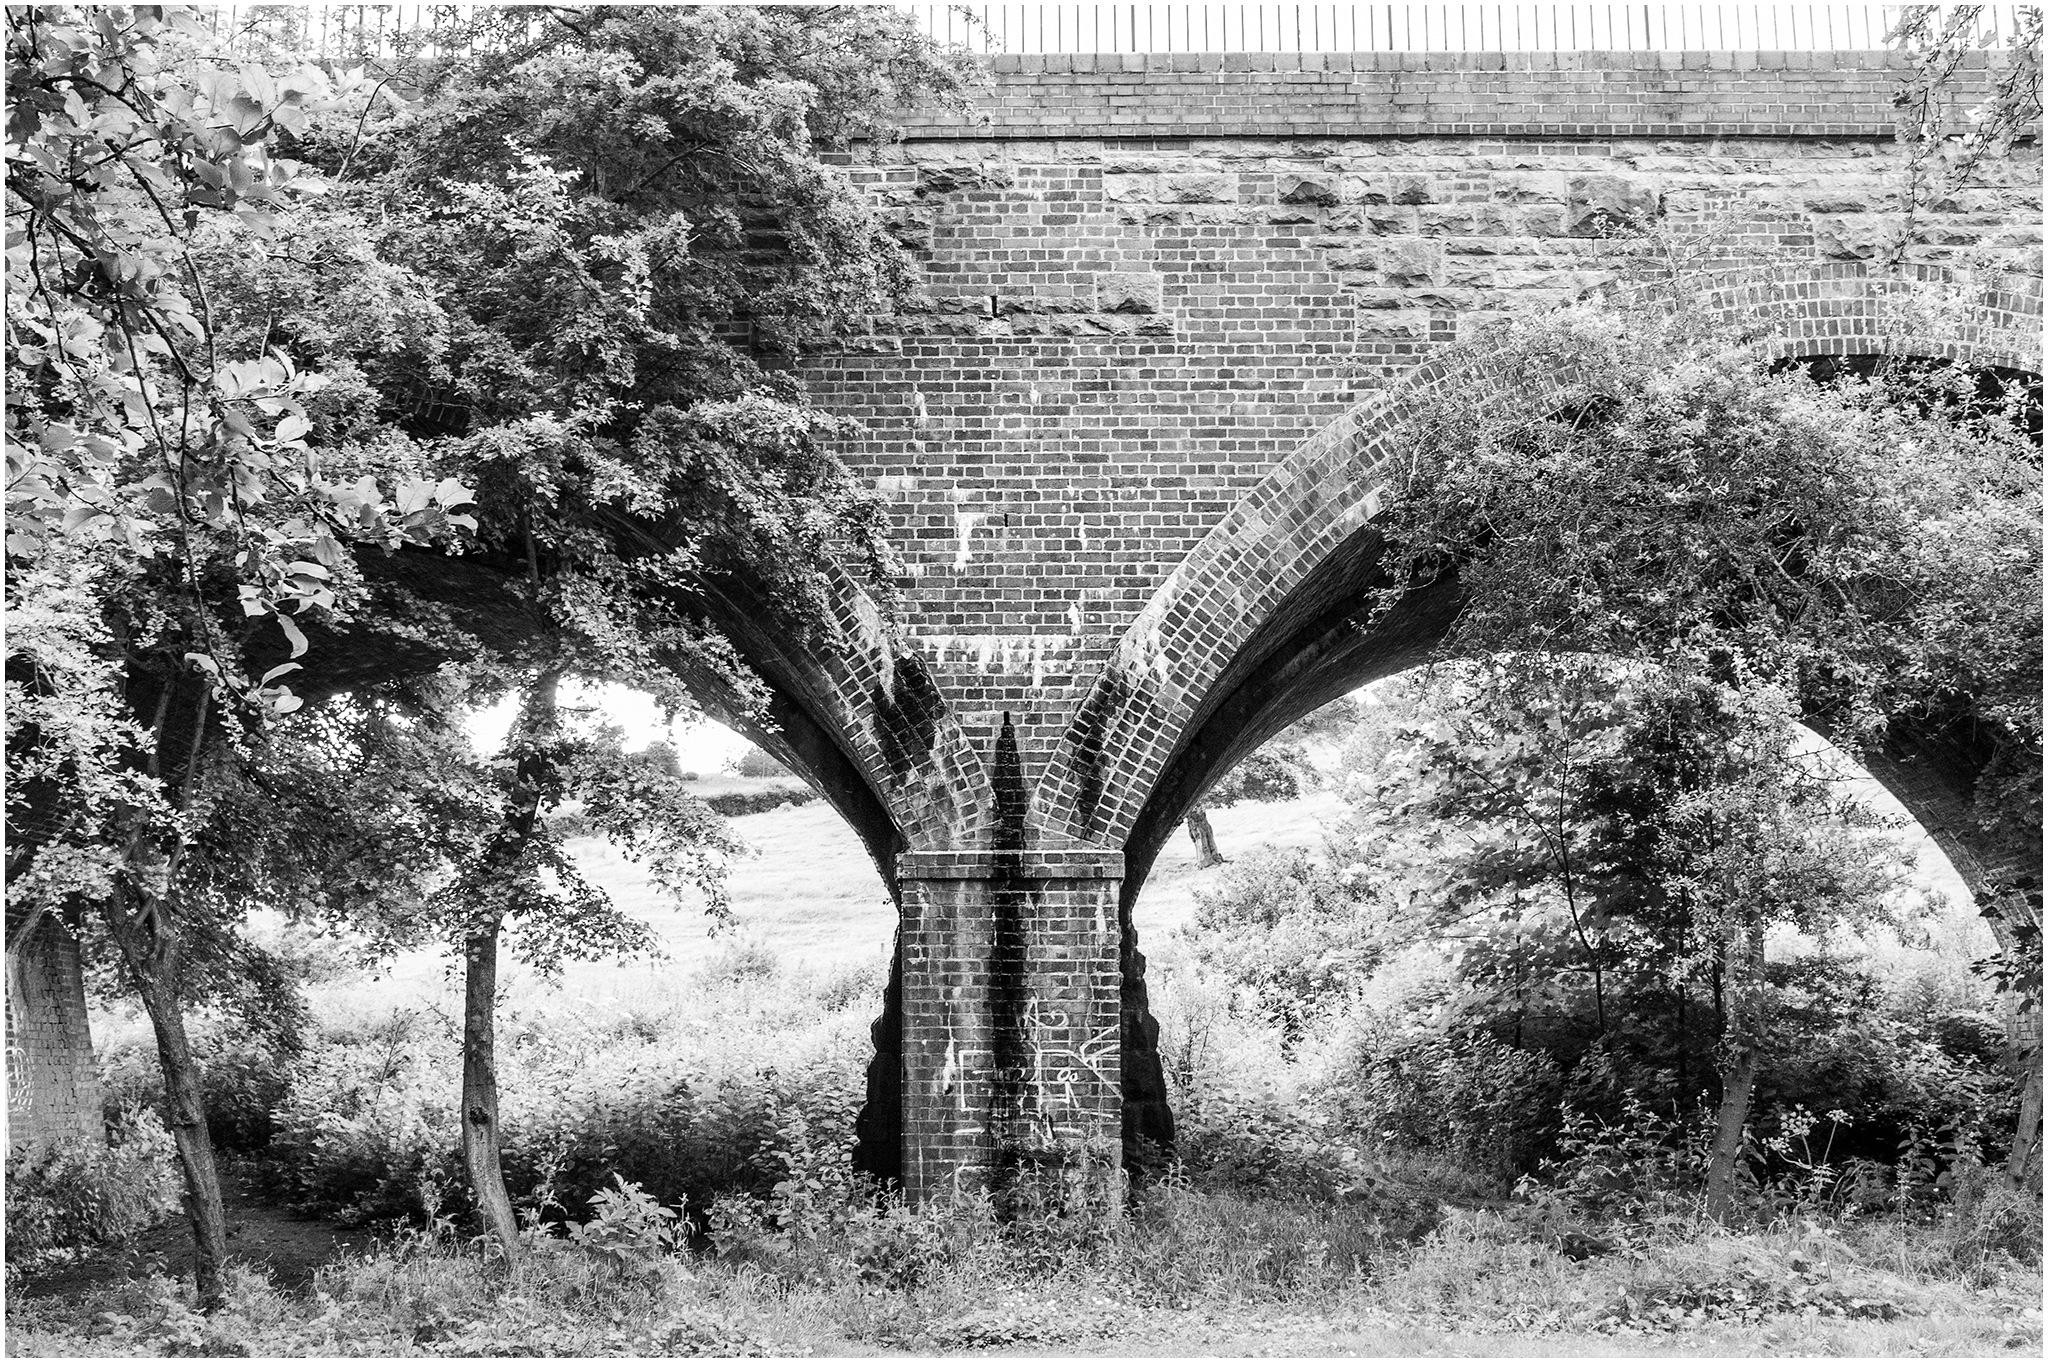 Under the Bridge - part 2 by Clive Ayron